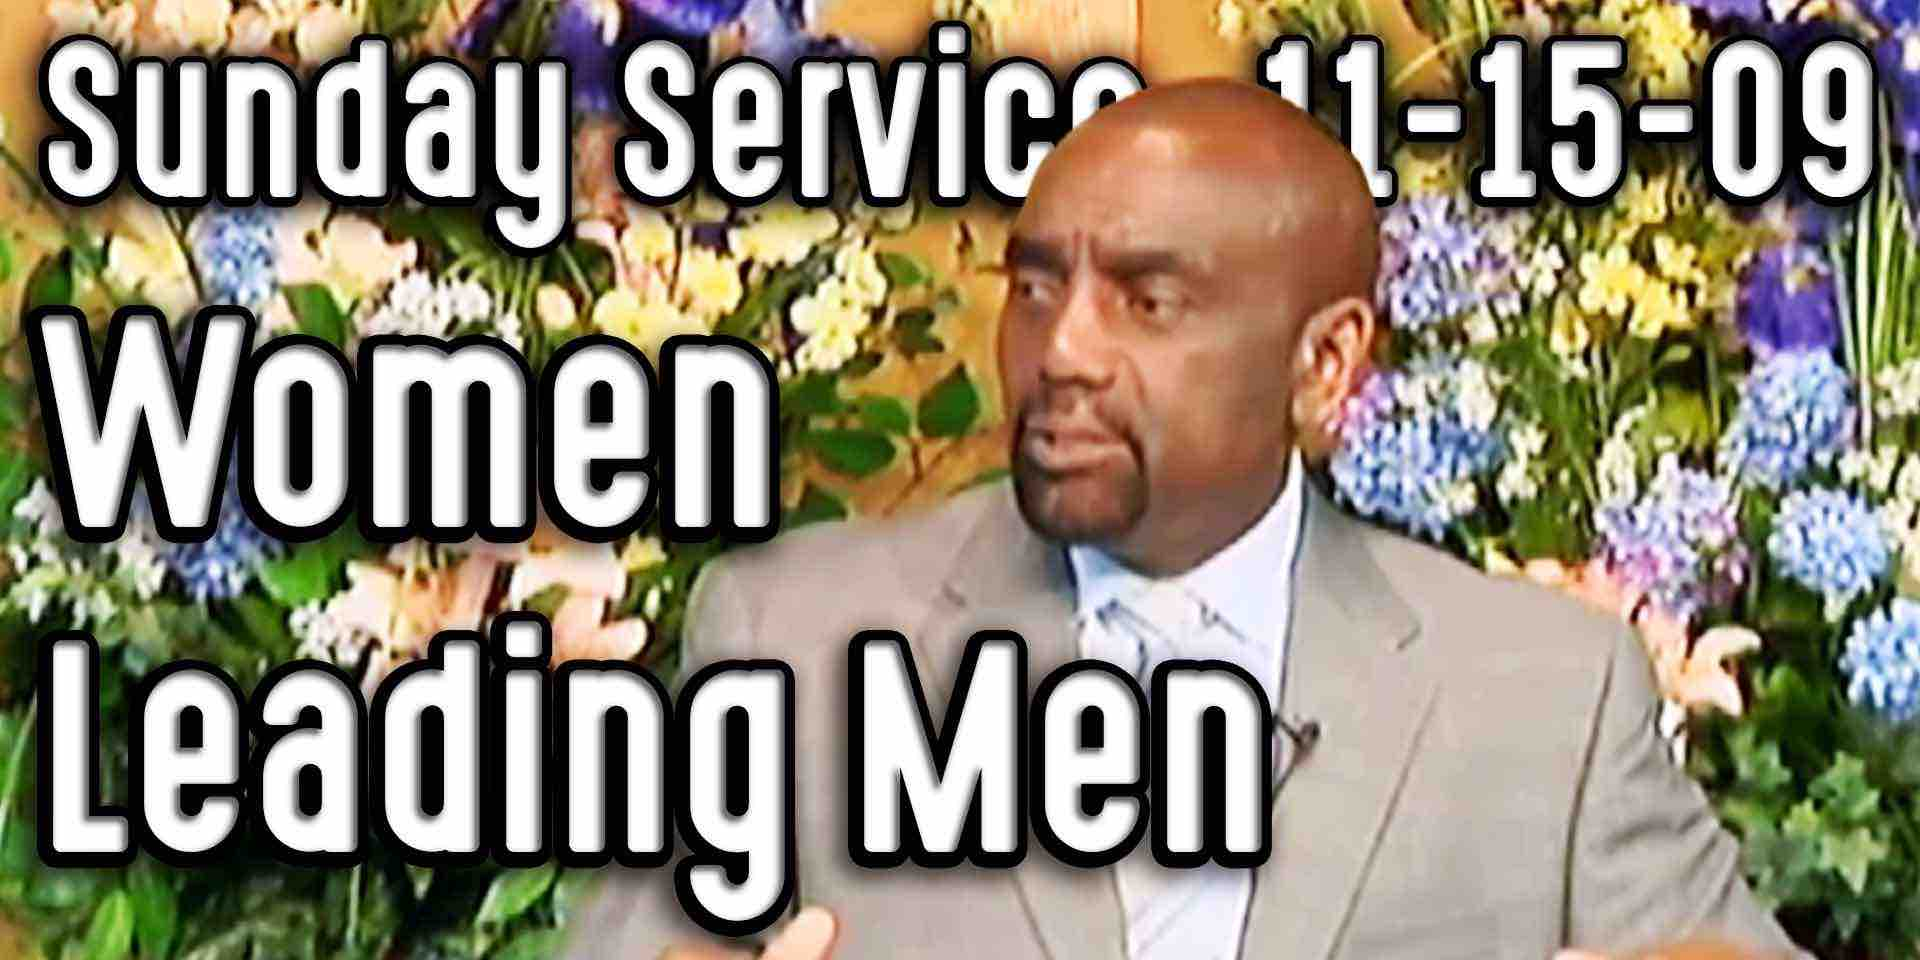 Women Leading Men (Sunday Service 11/15/09)